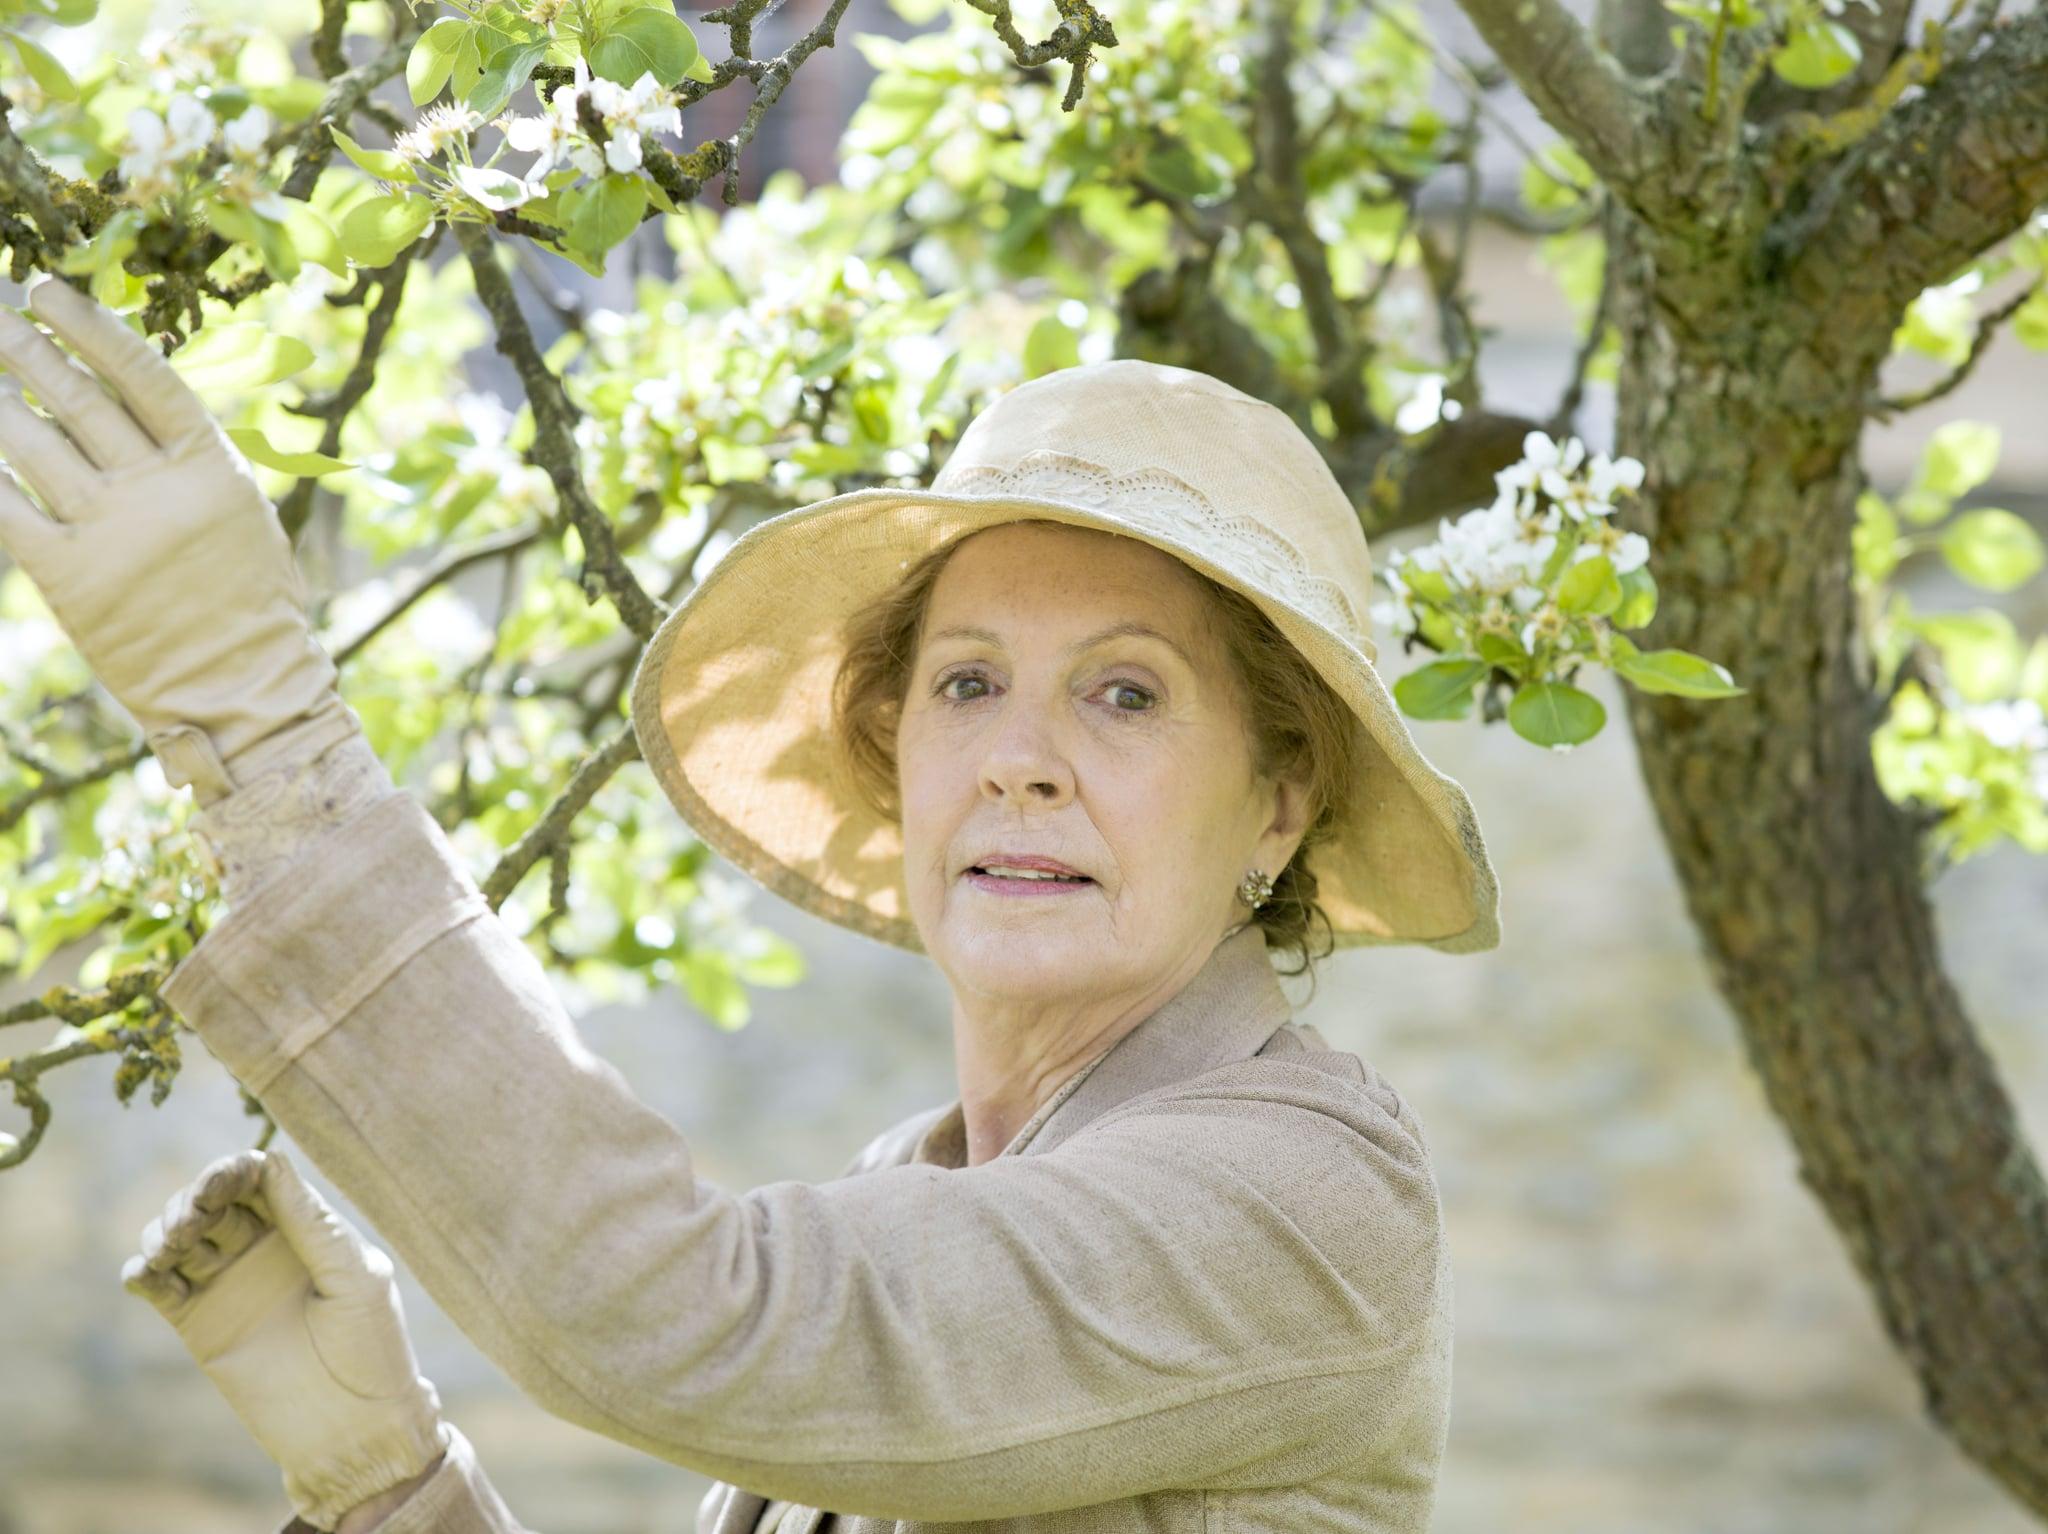 Isobel Crawley (Penelope Wilton) picks flowers from a tree.